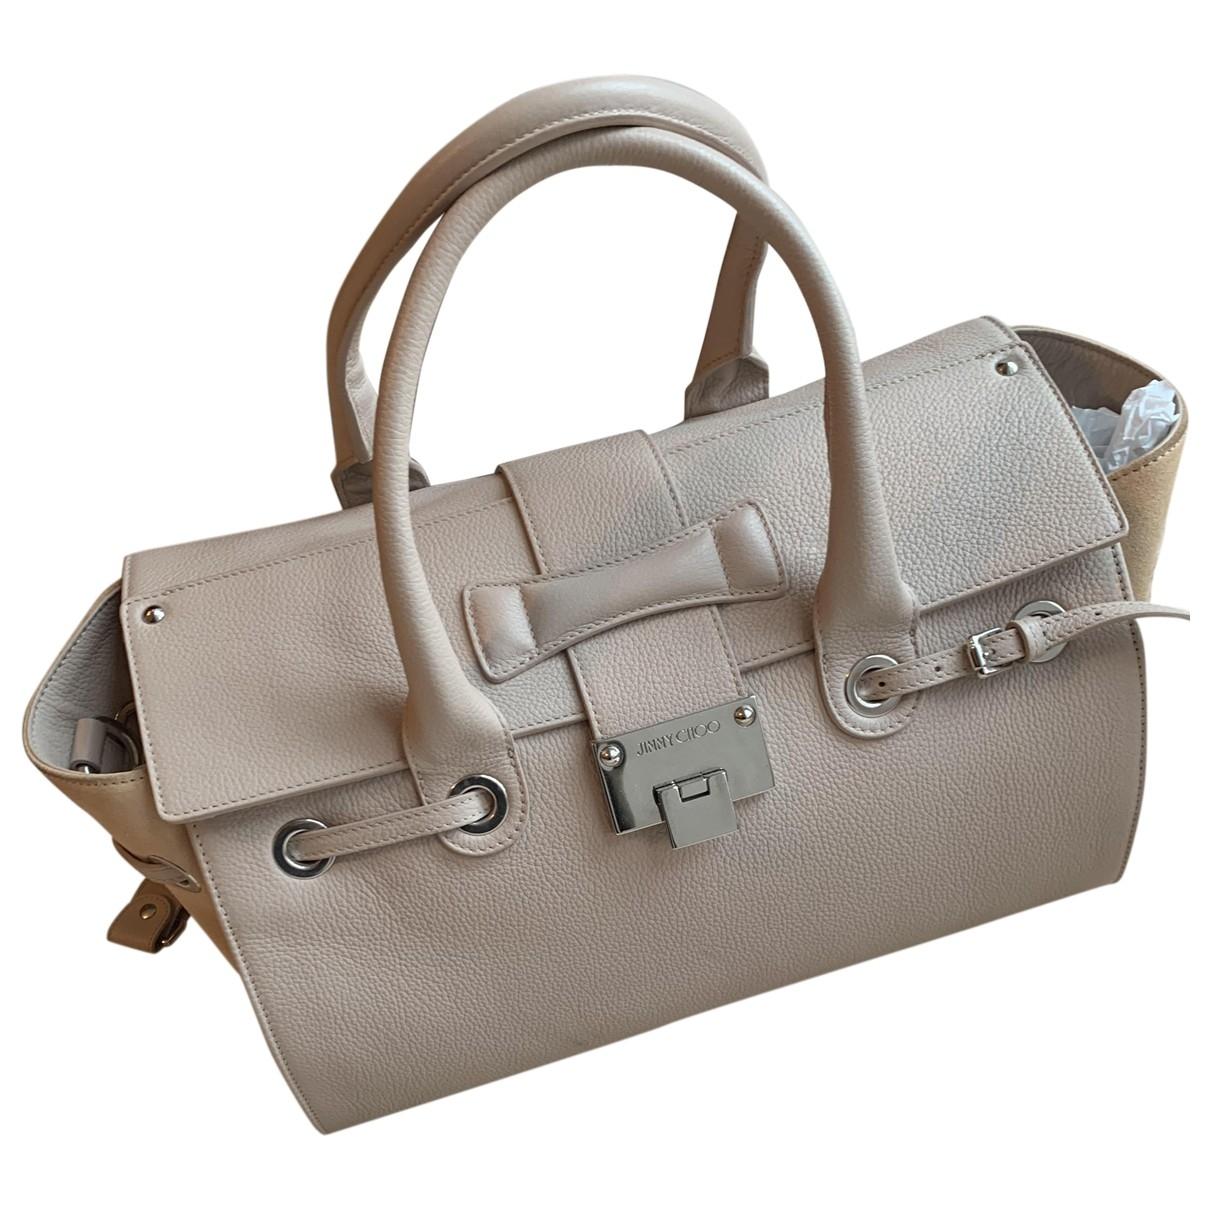 Jimmy Choo \N Beige Leather handbag for Women \N